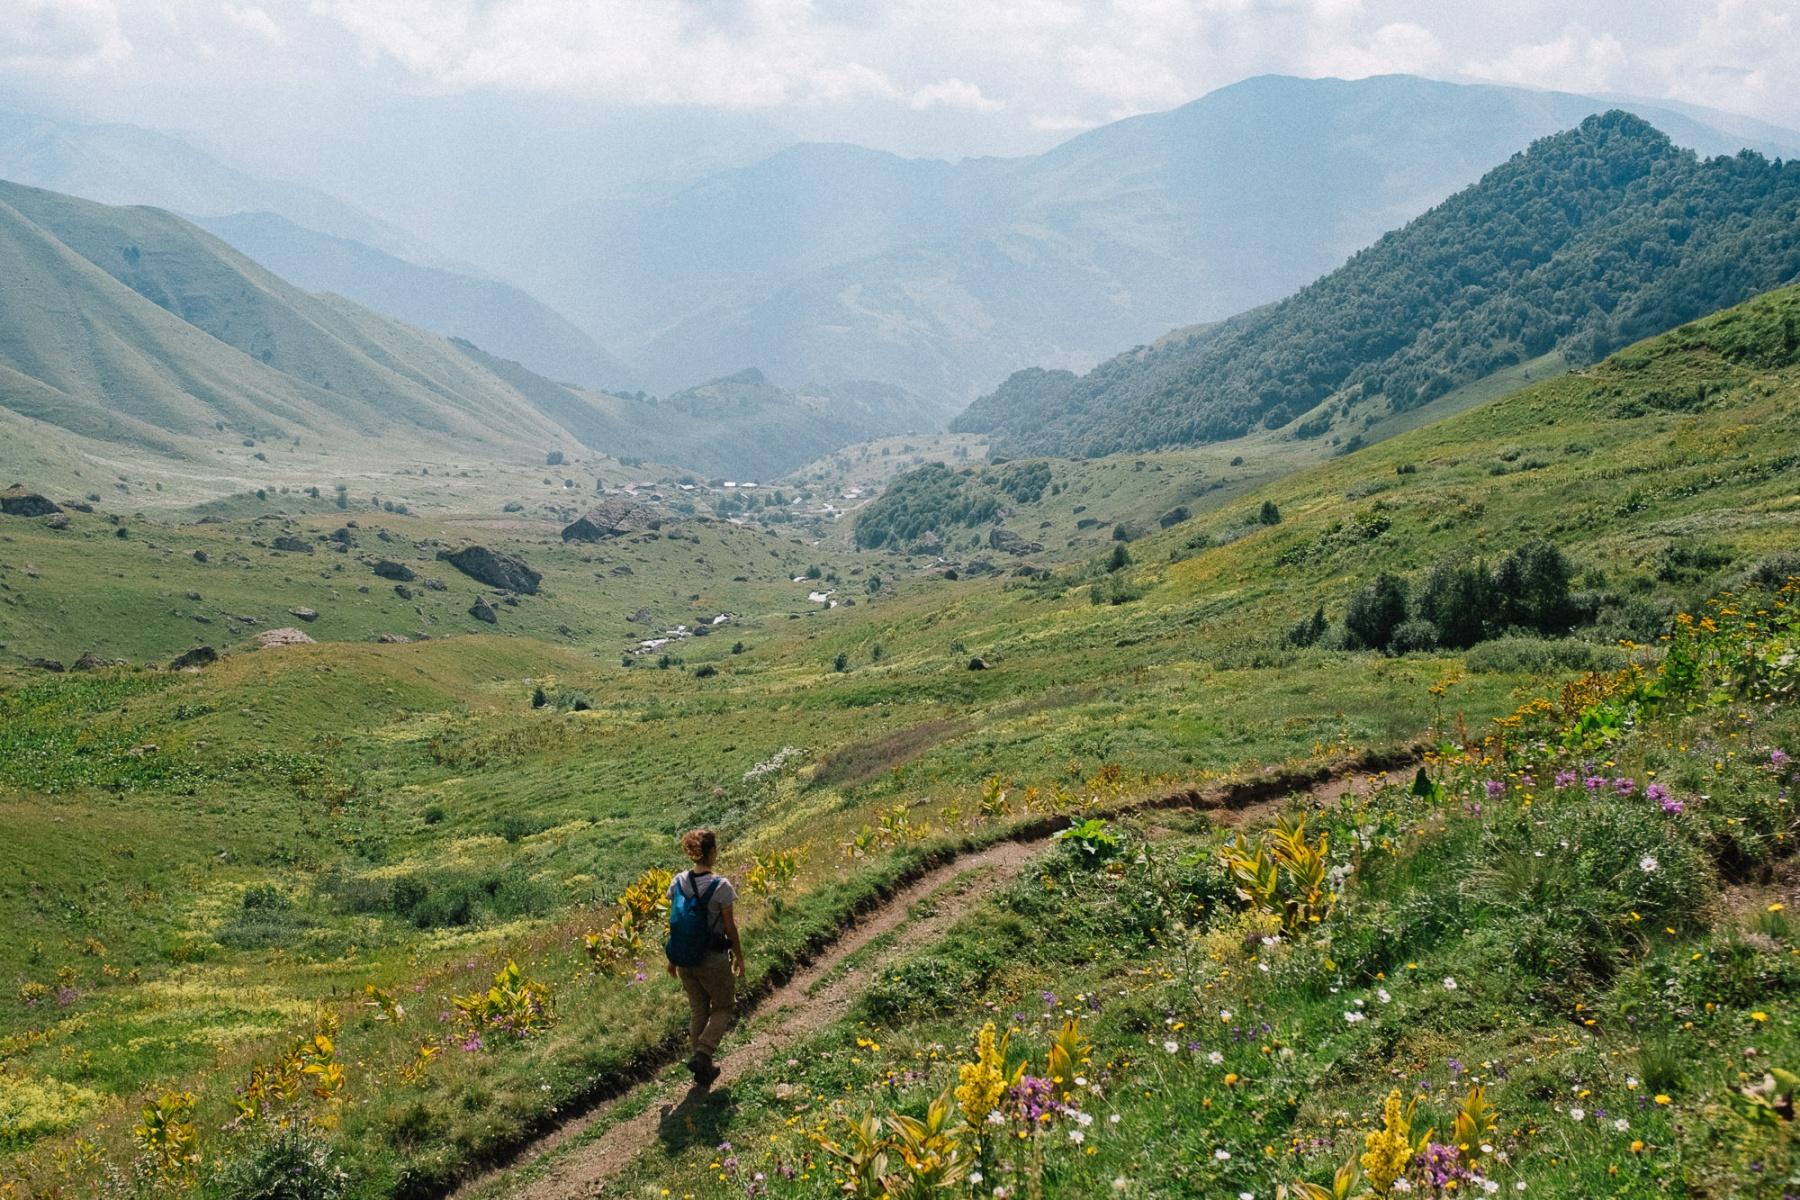 Sabina hiking back to Roshka guesthouse